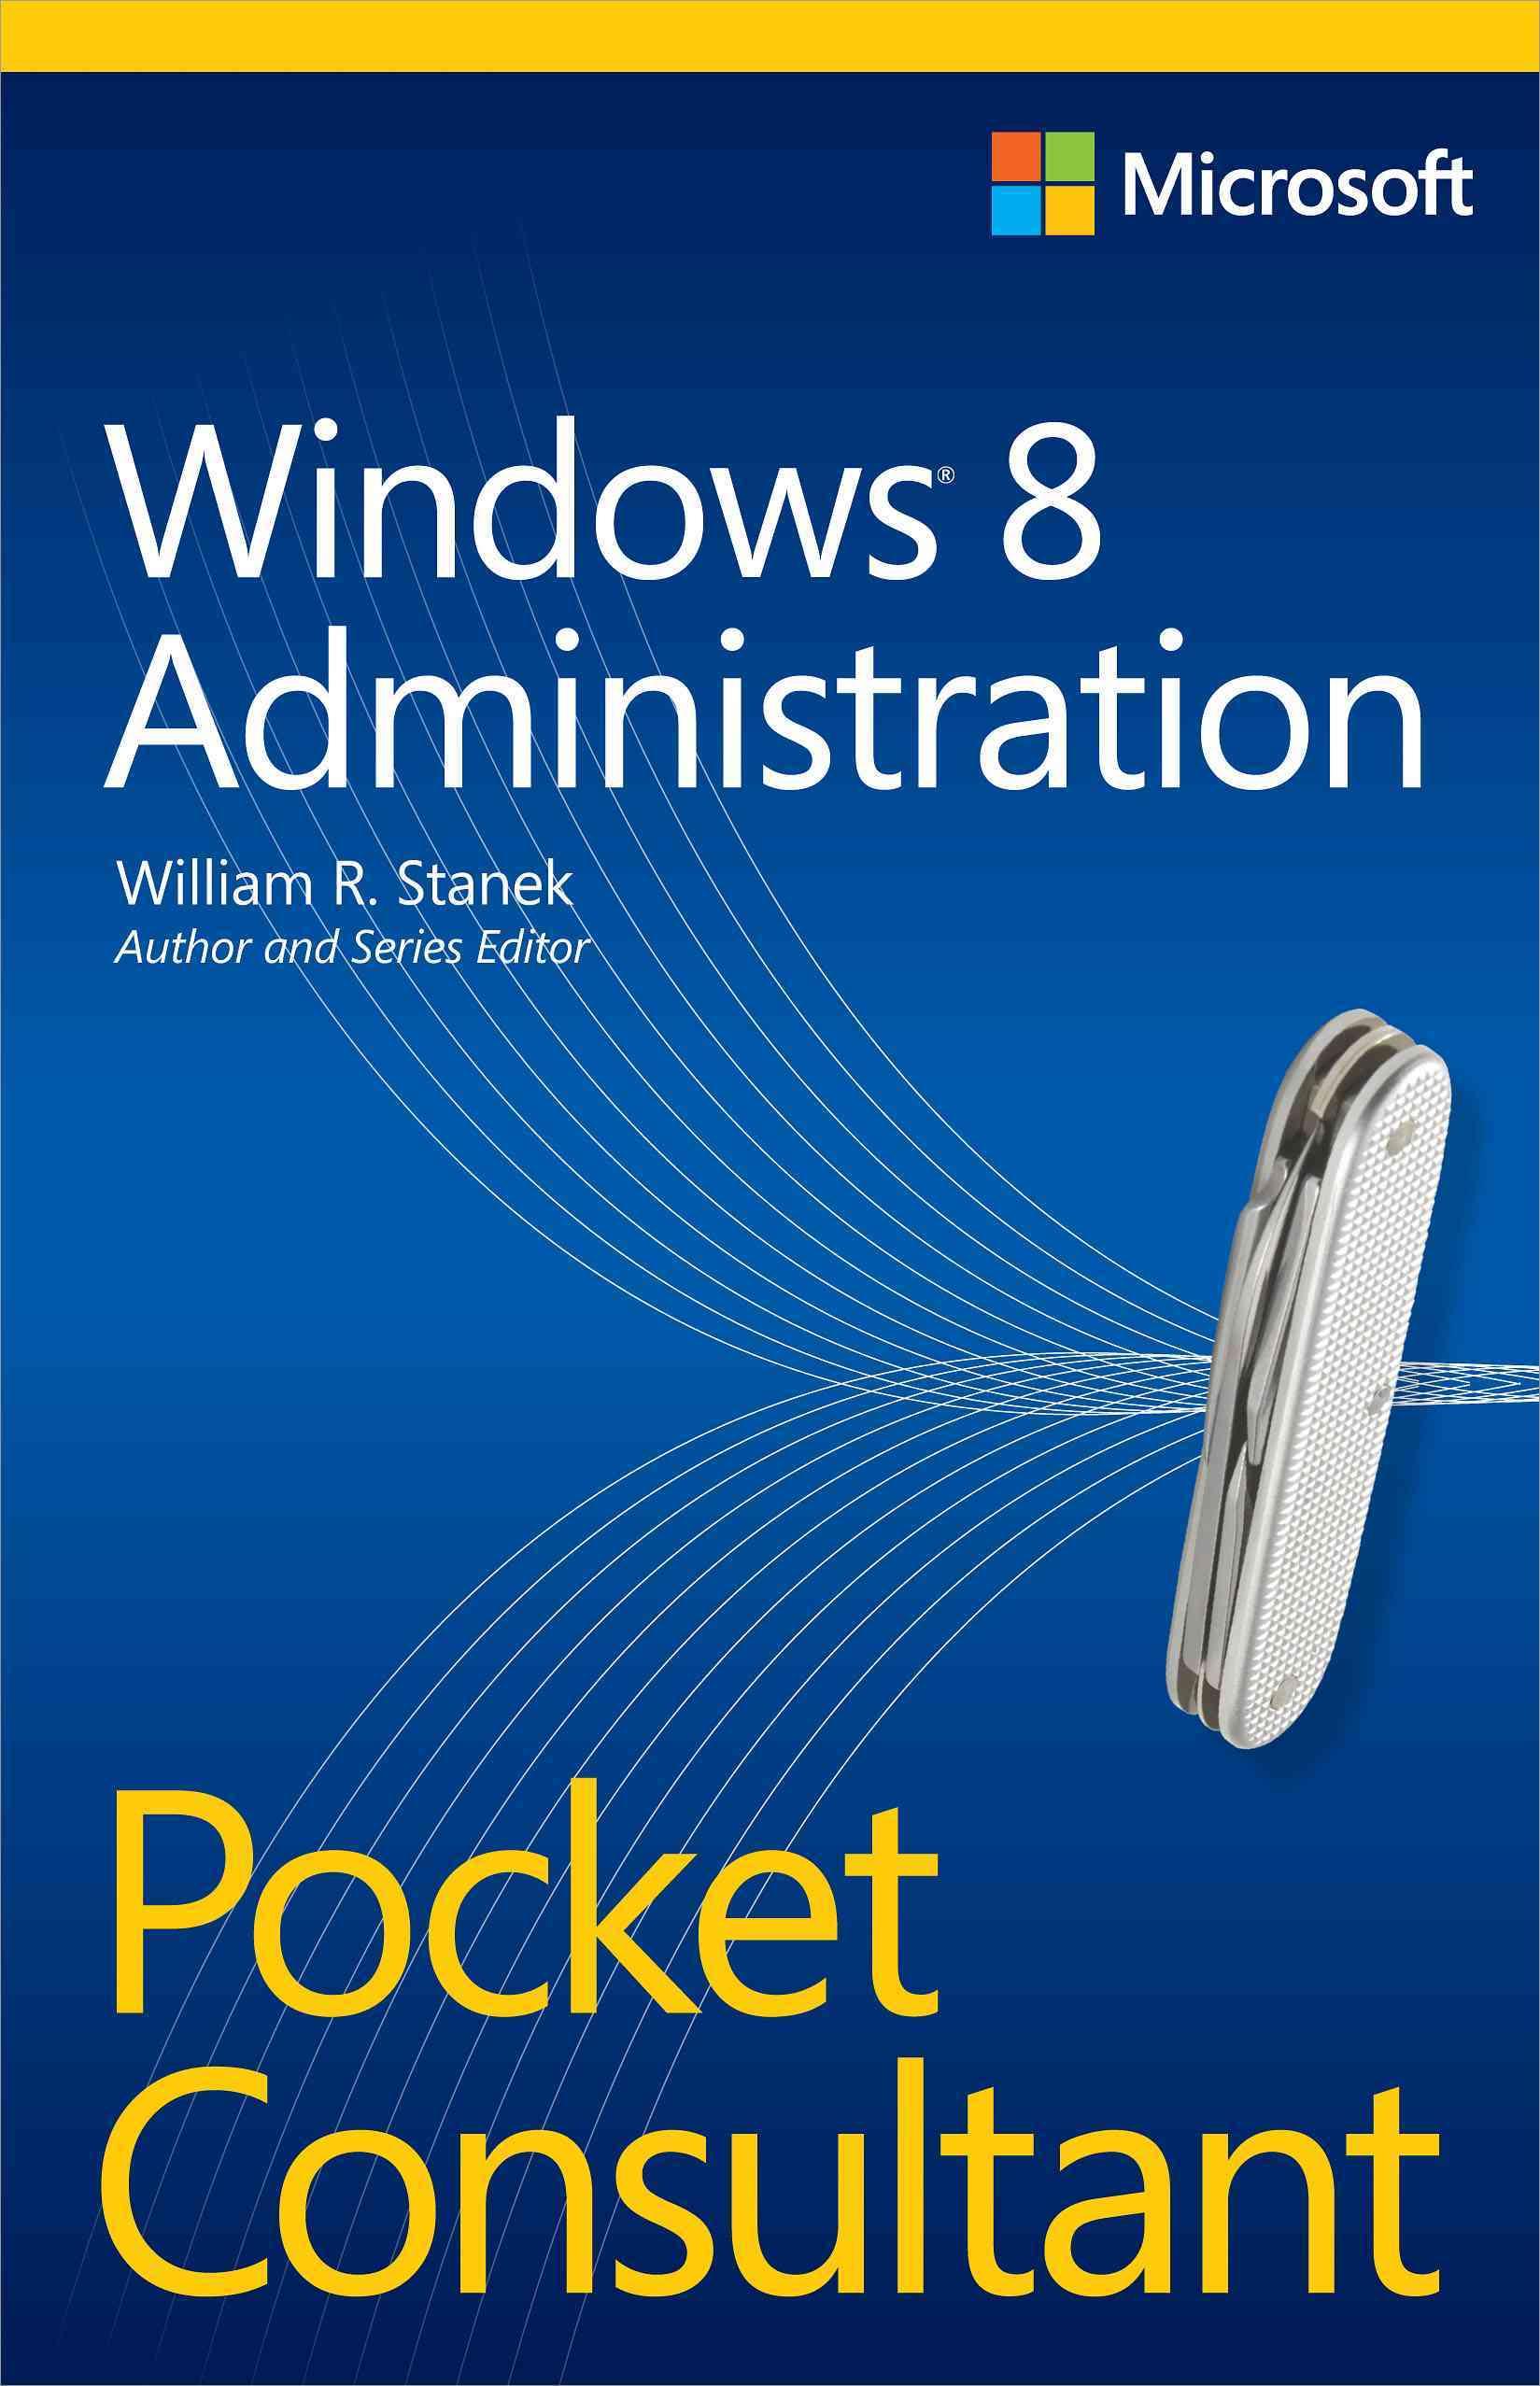 Microsoft Windows 8 Administration Pocket Consultant (Paperback)